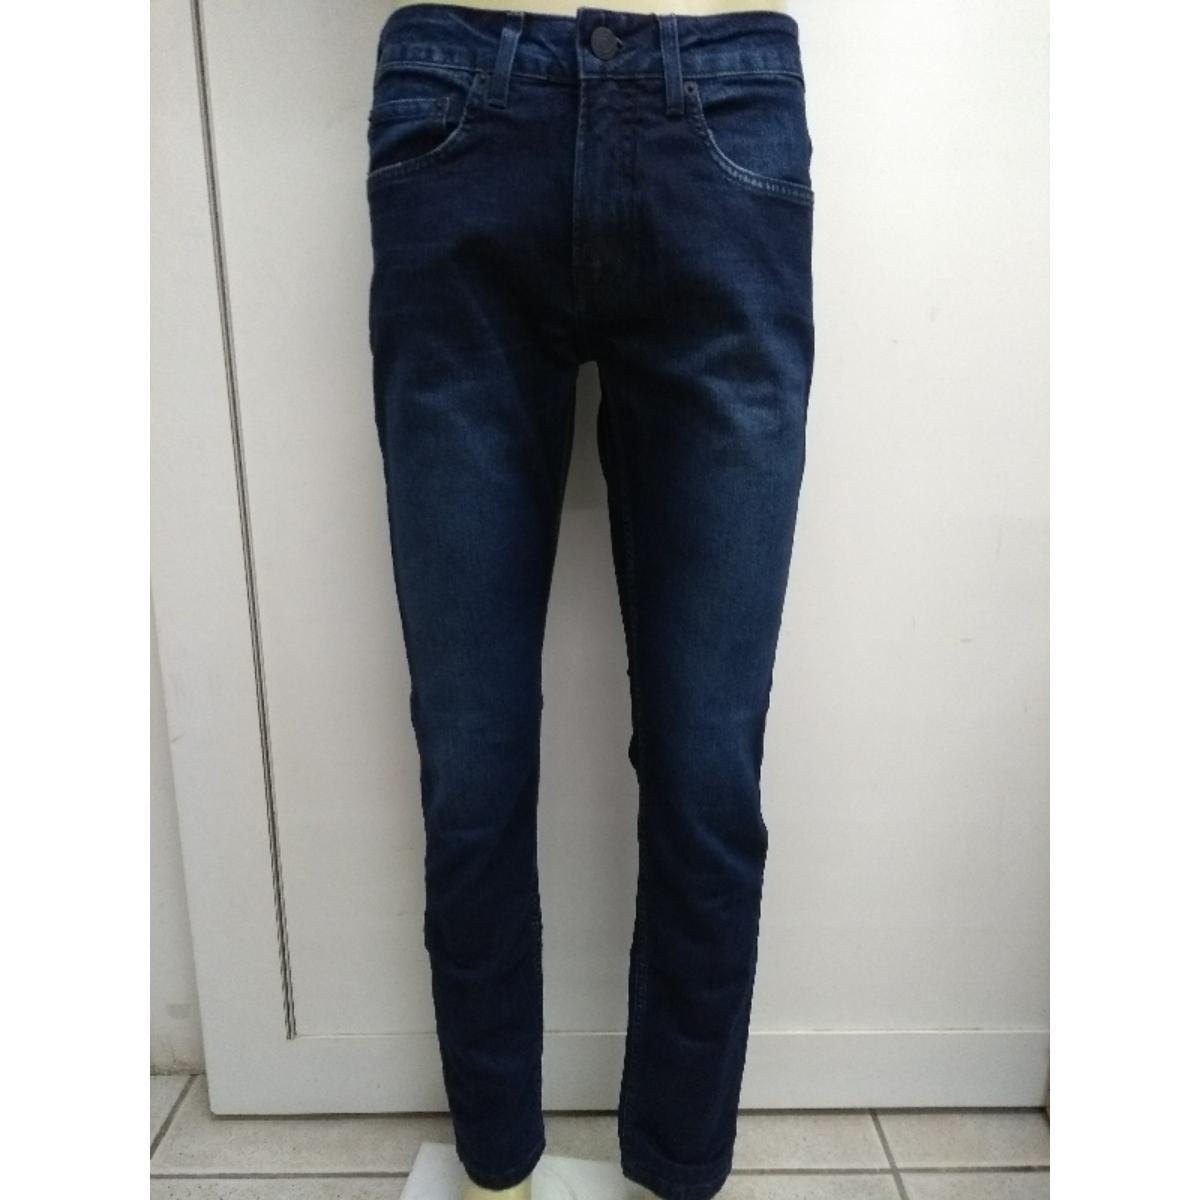 Calça Masculina Calvin Klein Cm0oc11dk206 Marinho